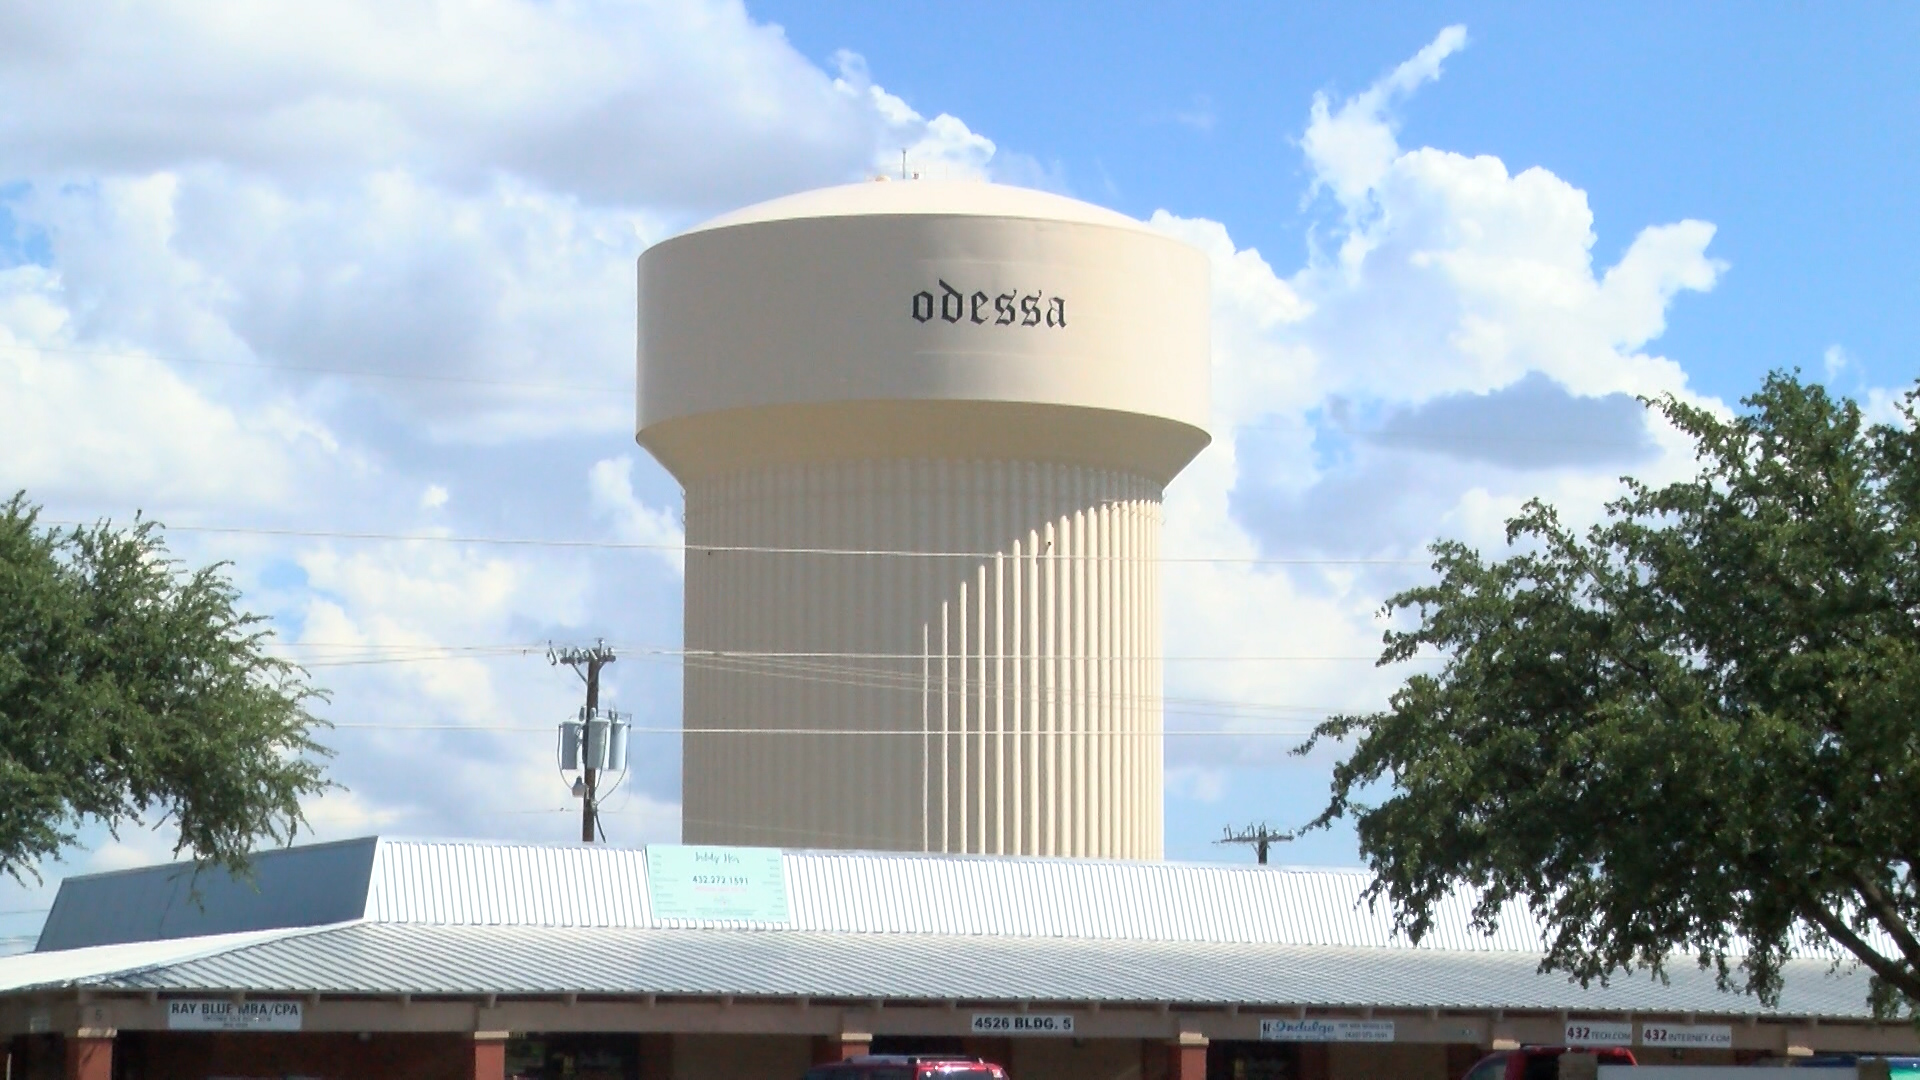 ODESSA WATER TOWER_1467171743865.jpg